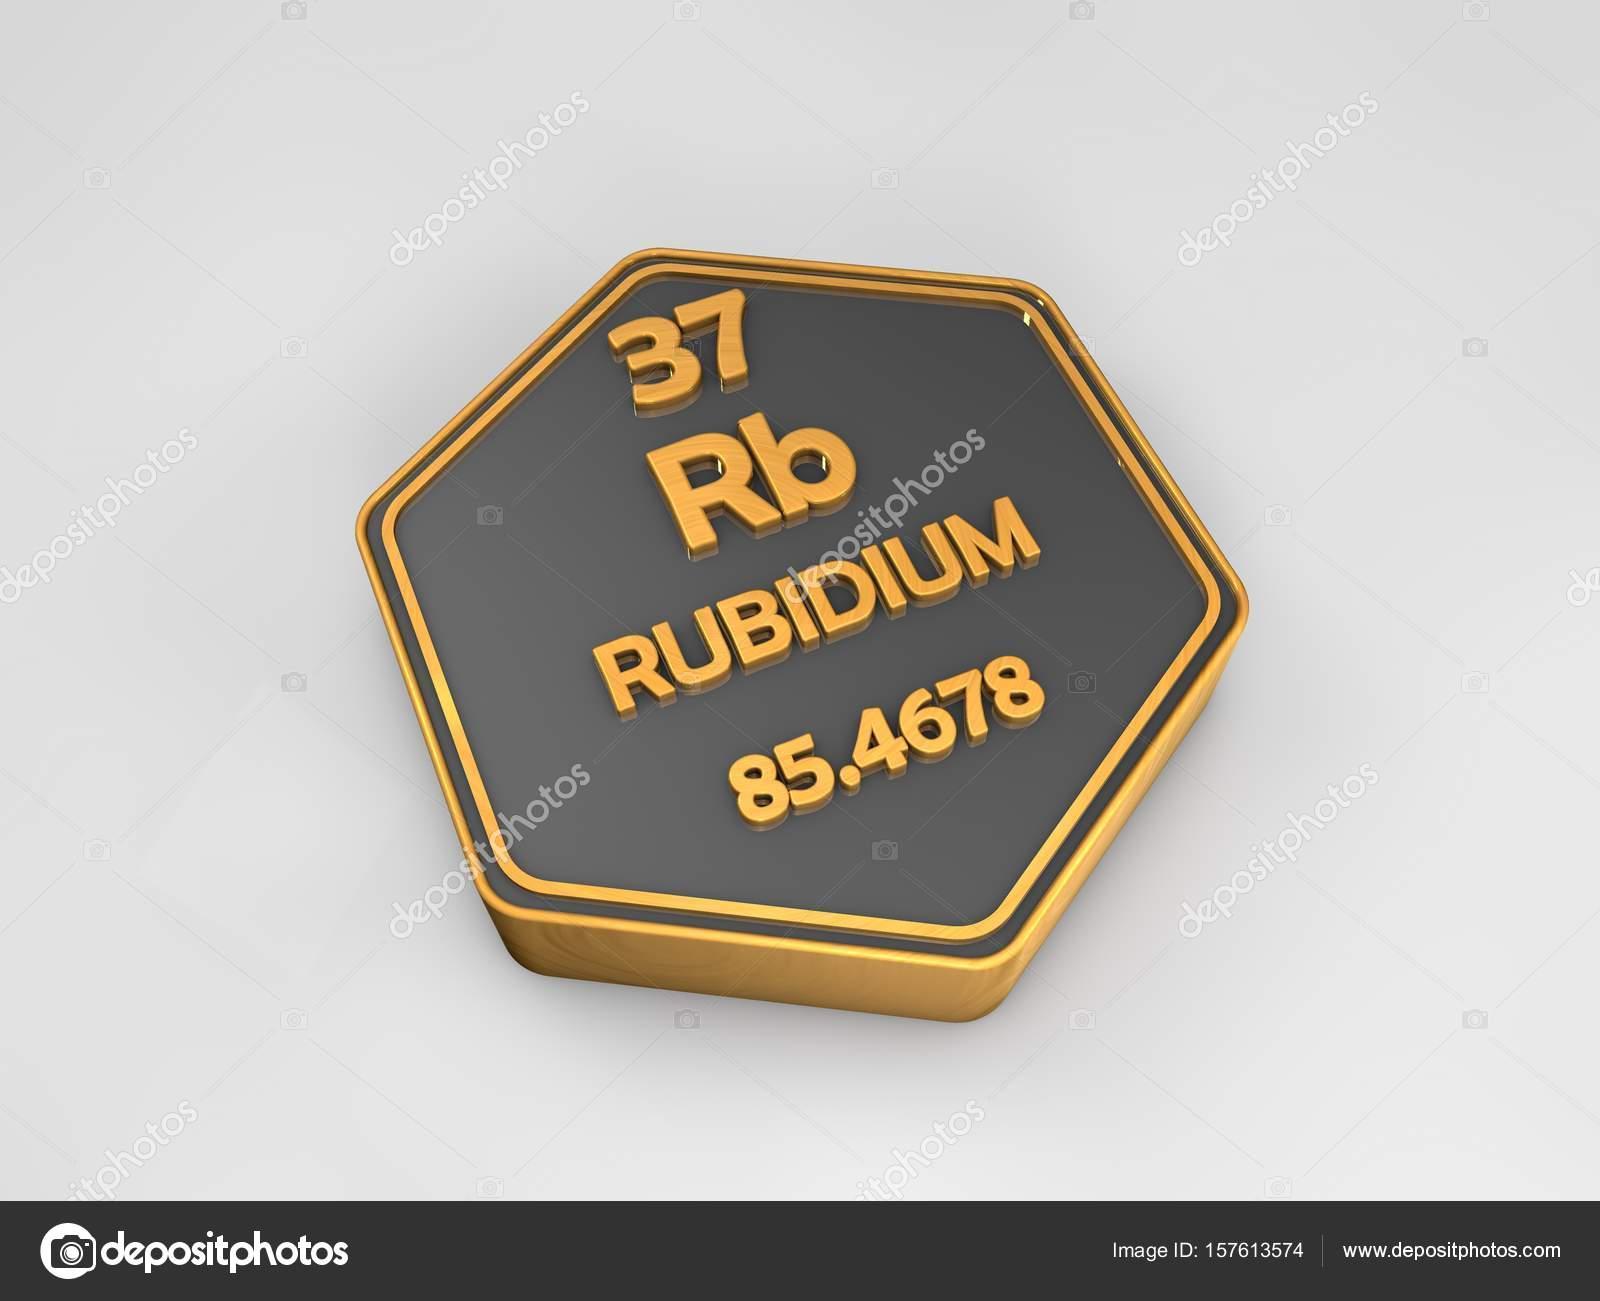 Rubidium rb chemical element periodic table hexagonal shape 3d rubidium rb chemical element periodic table hexagonal shape 3d render stock photo buycottarizona Choice Image